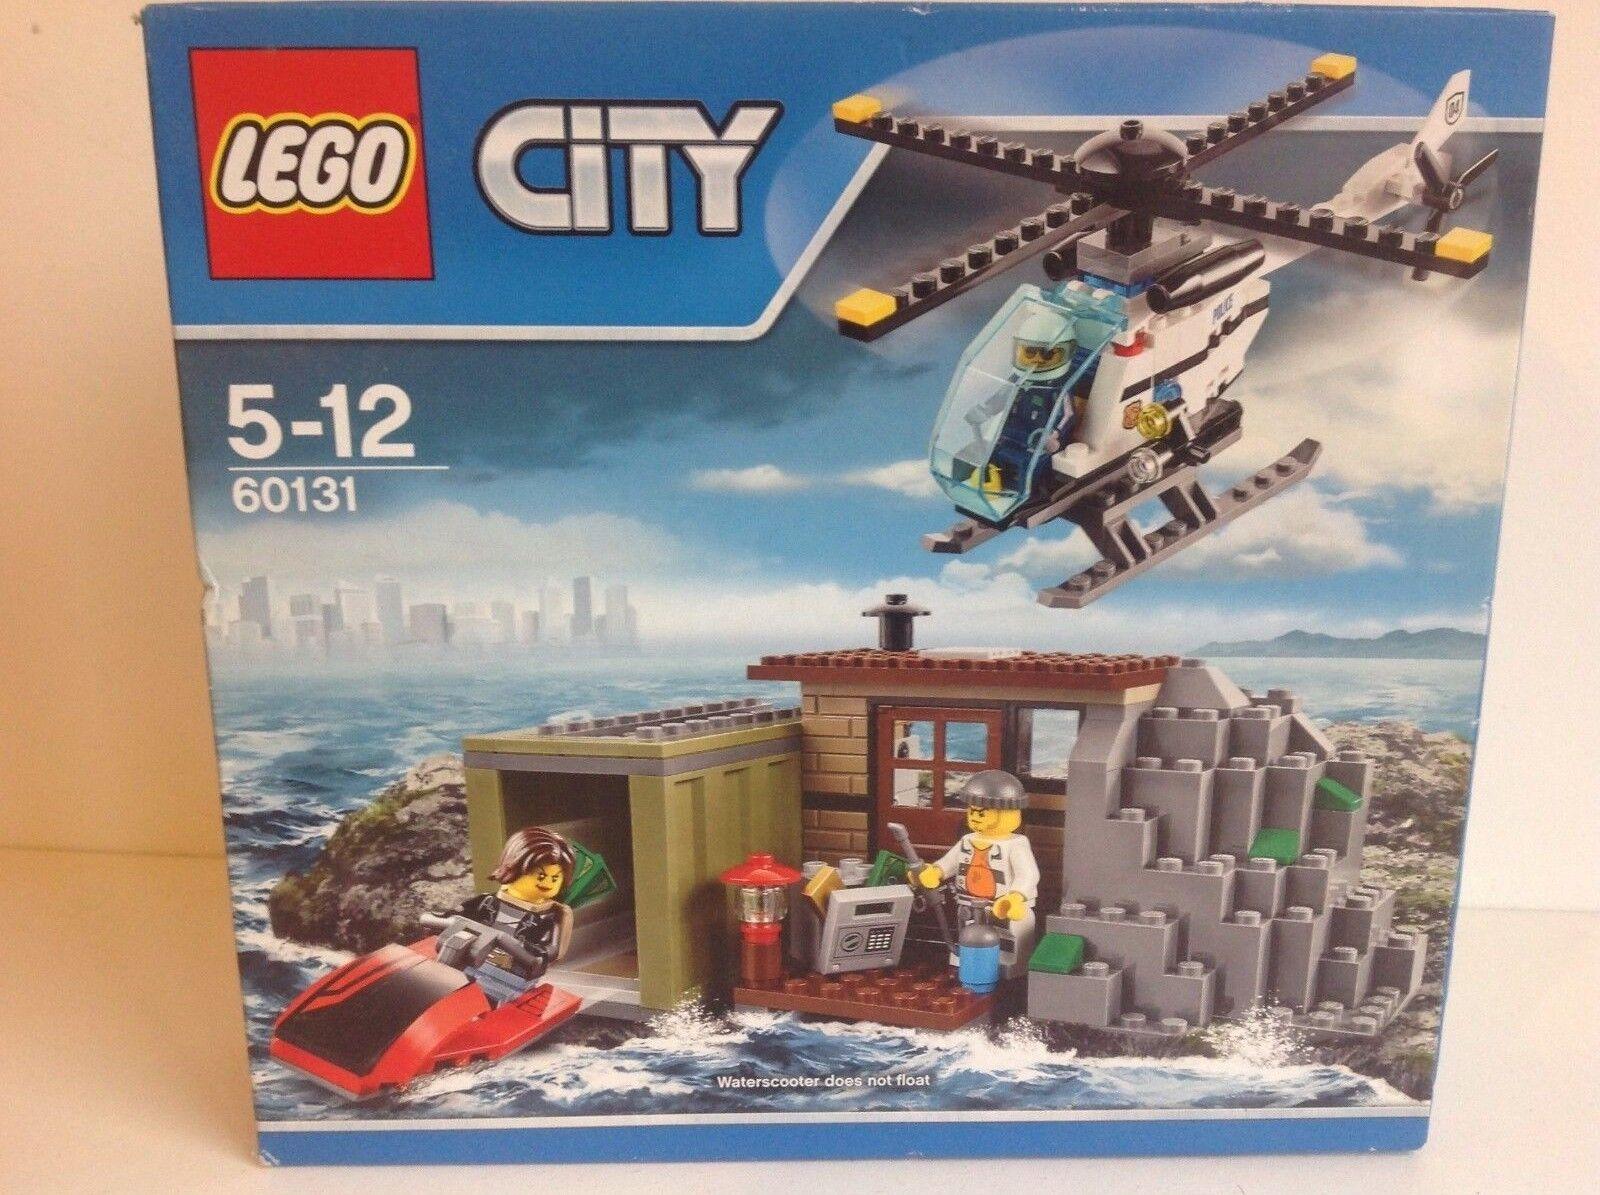 Lego City 60131 Crook's Island with 3 Mini Figures New Boxed Set